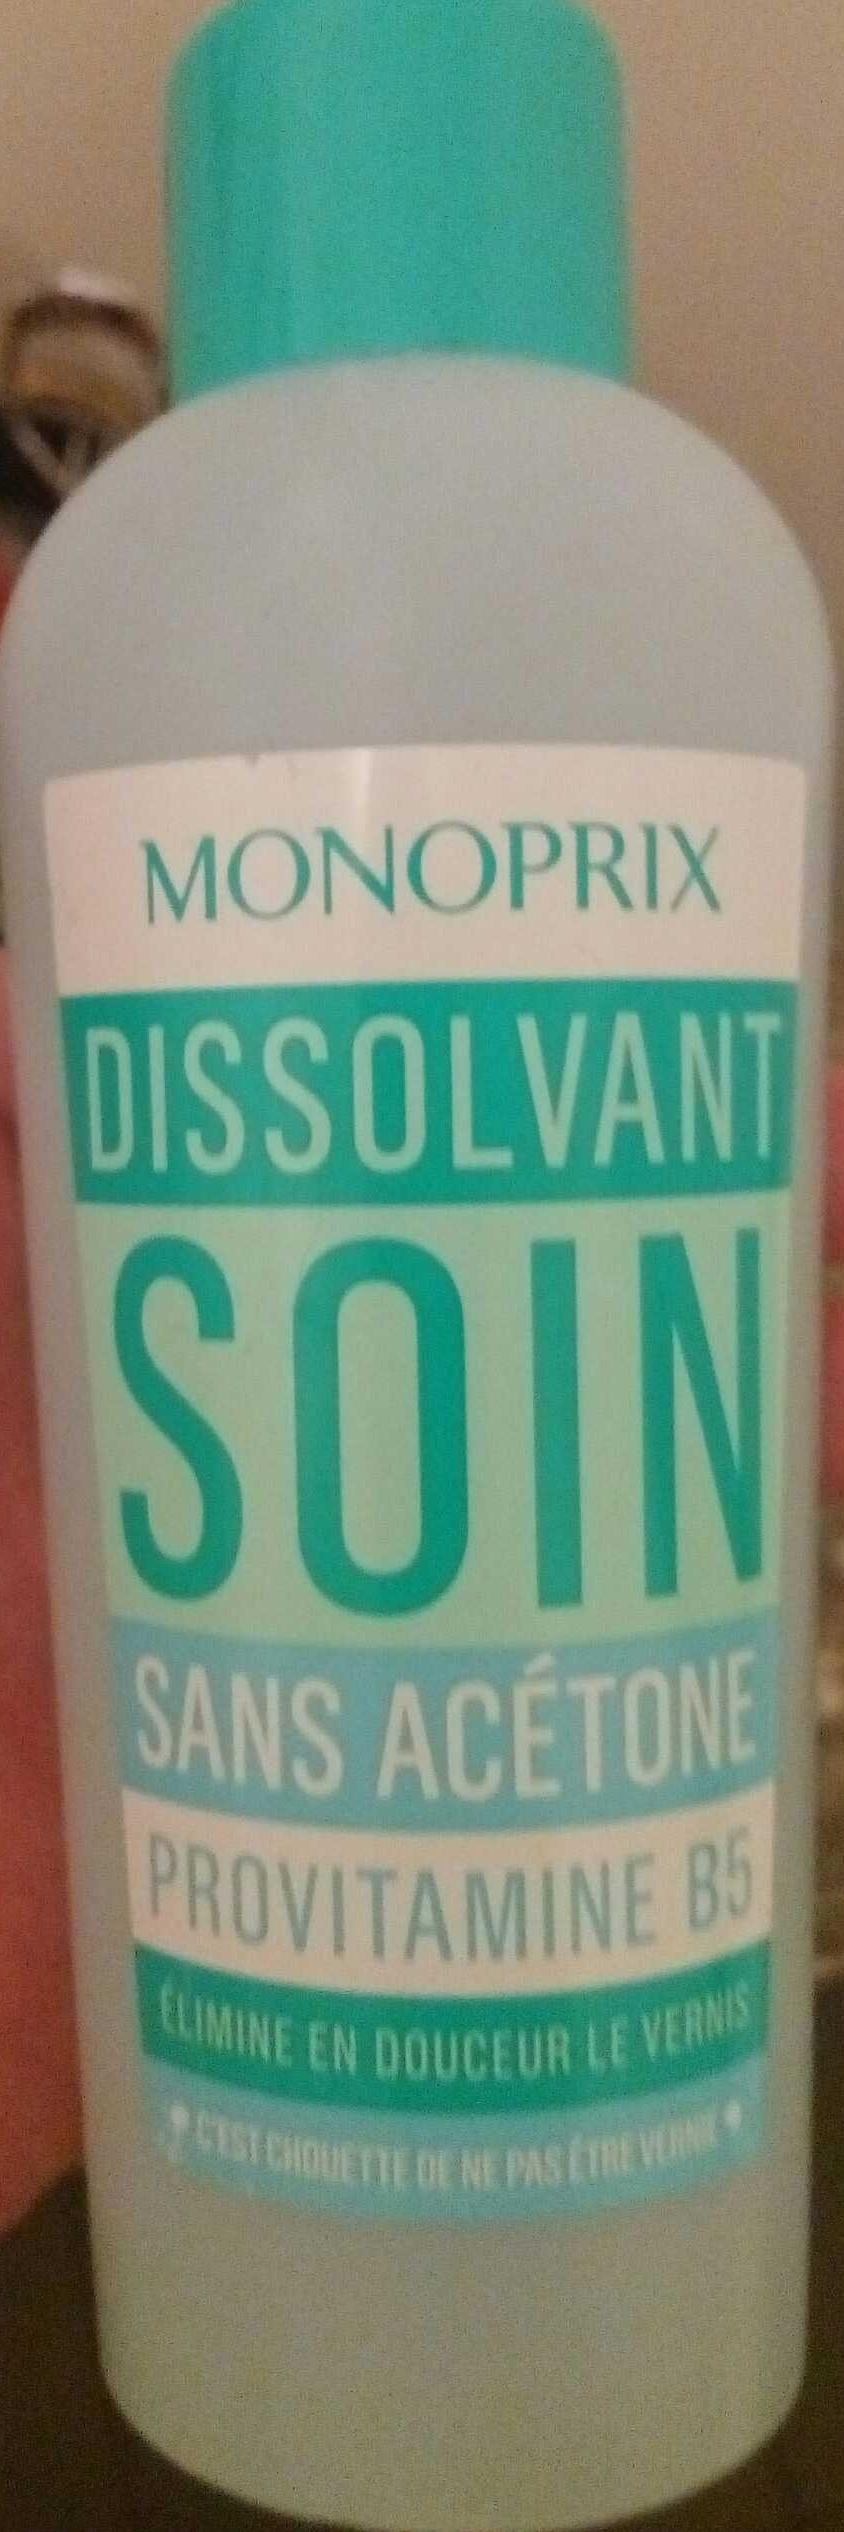 Dissolvant Soin - Product